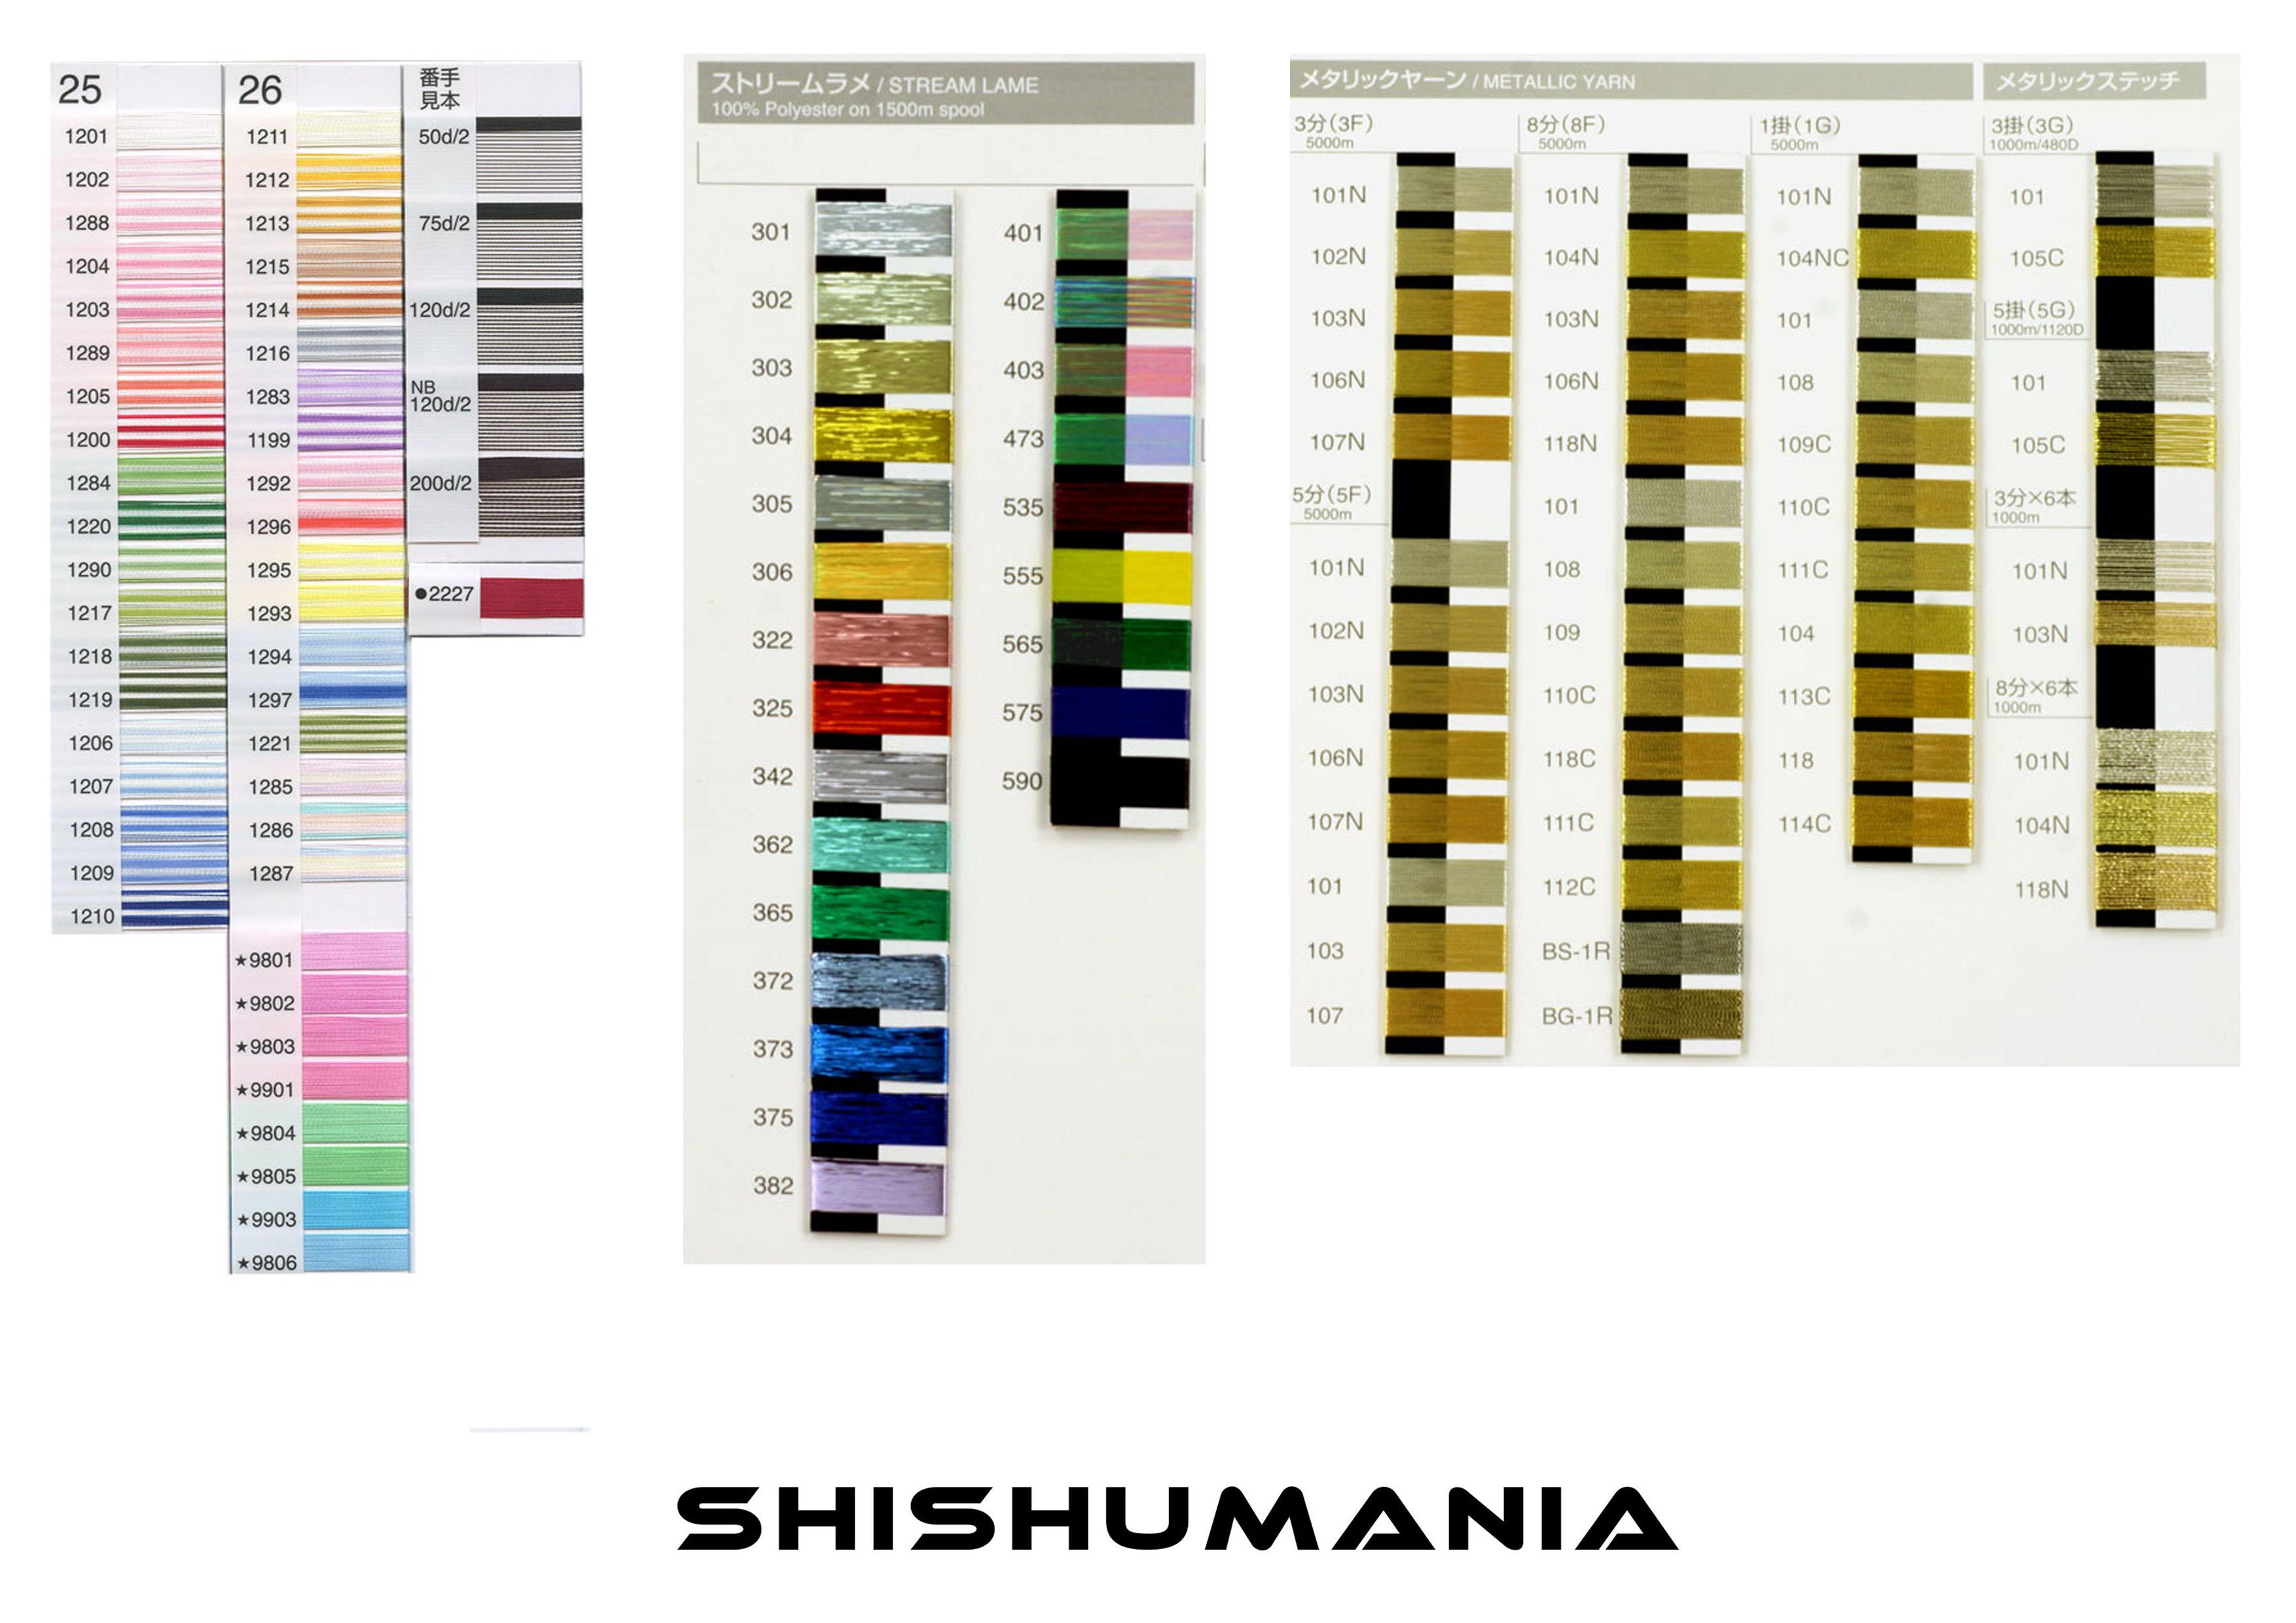 SHISHUMANIA 金糸・銀糸・ラメ糸